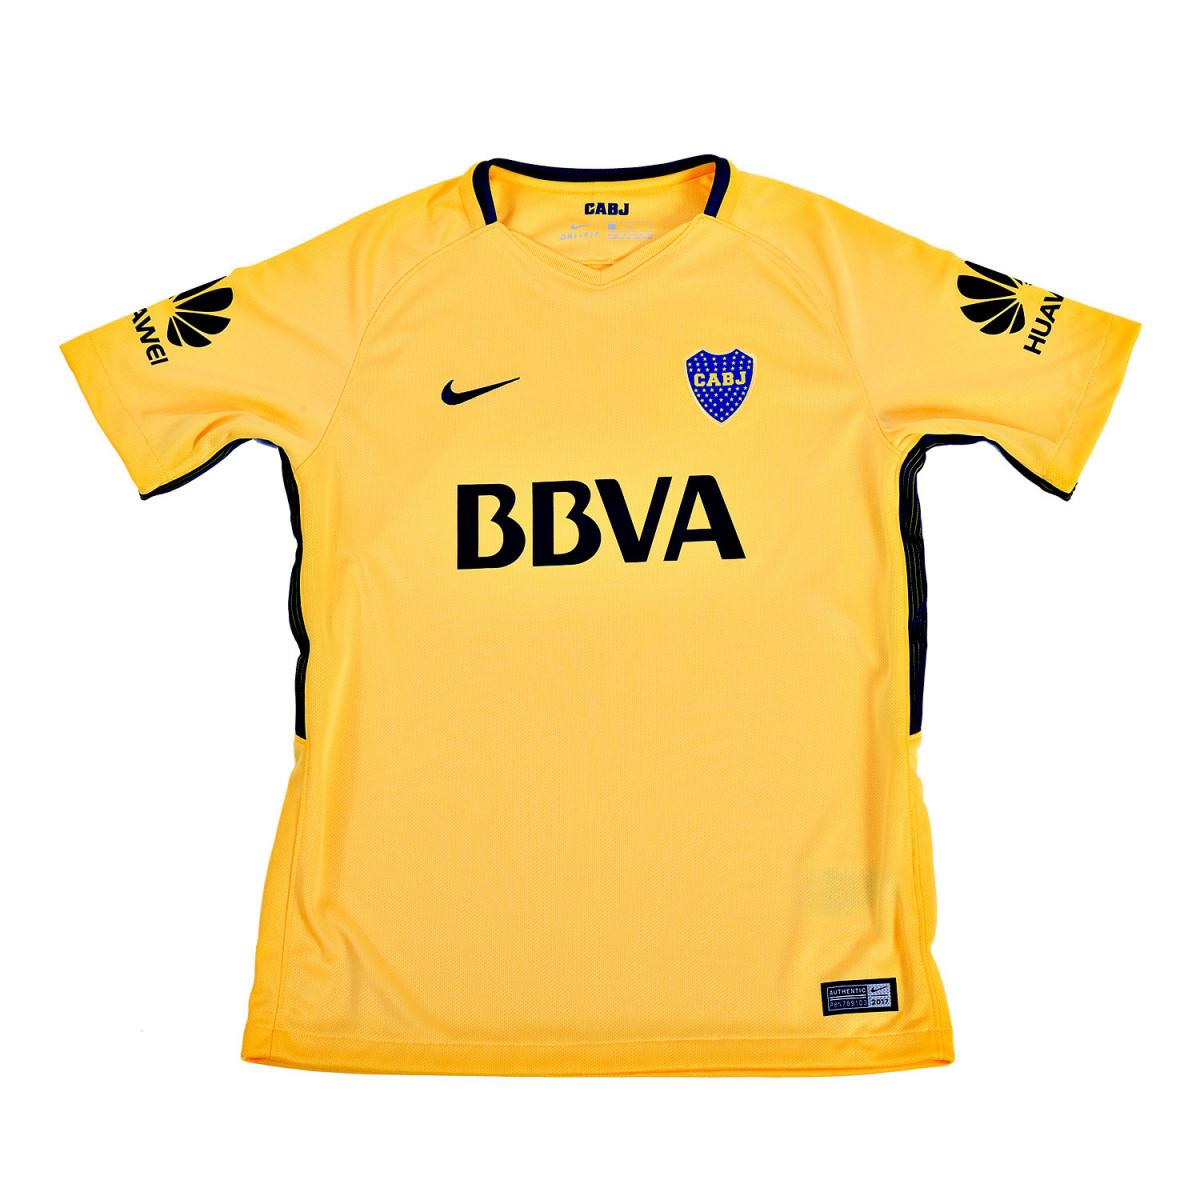 Camiseta Nike Boca Brt Stad Jsy Kids 2017